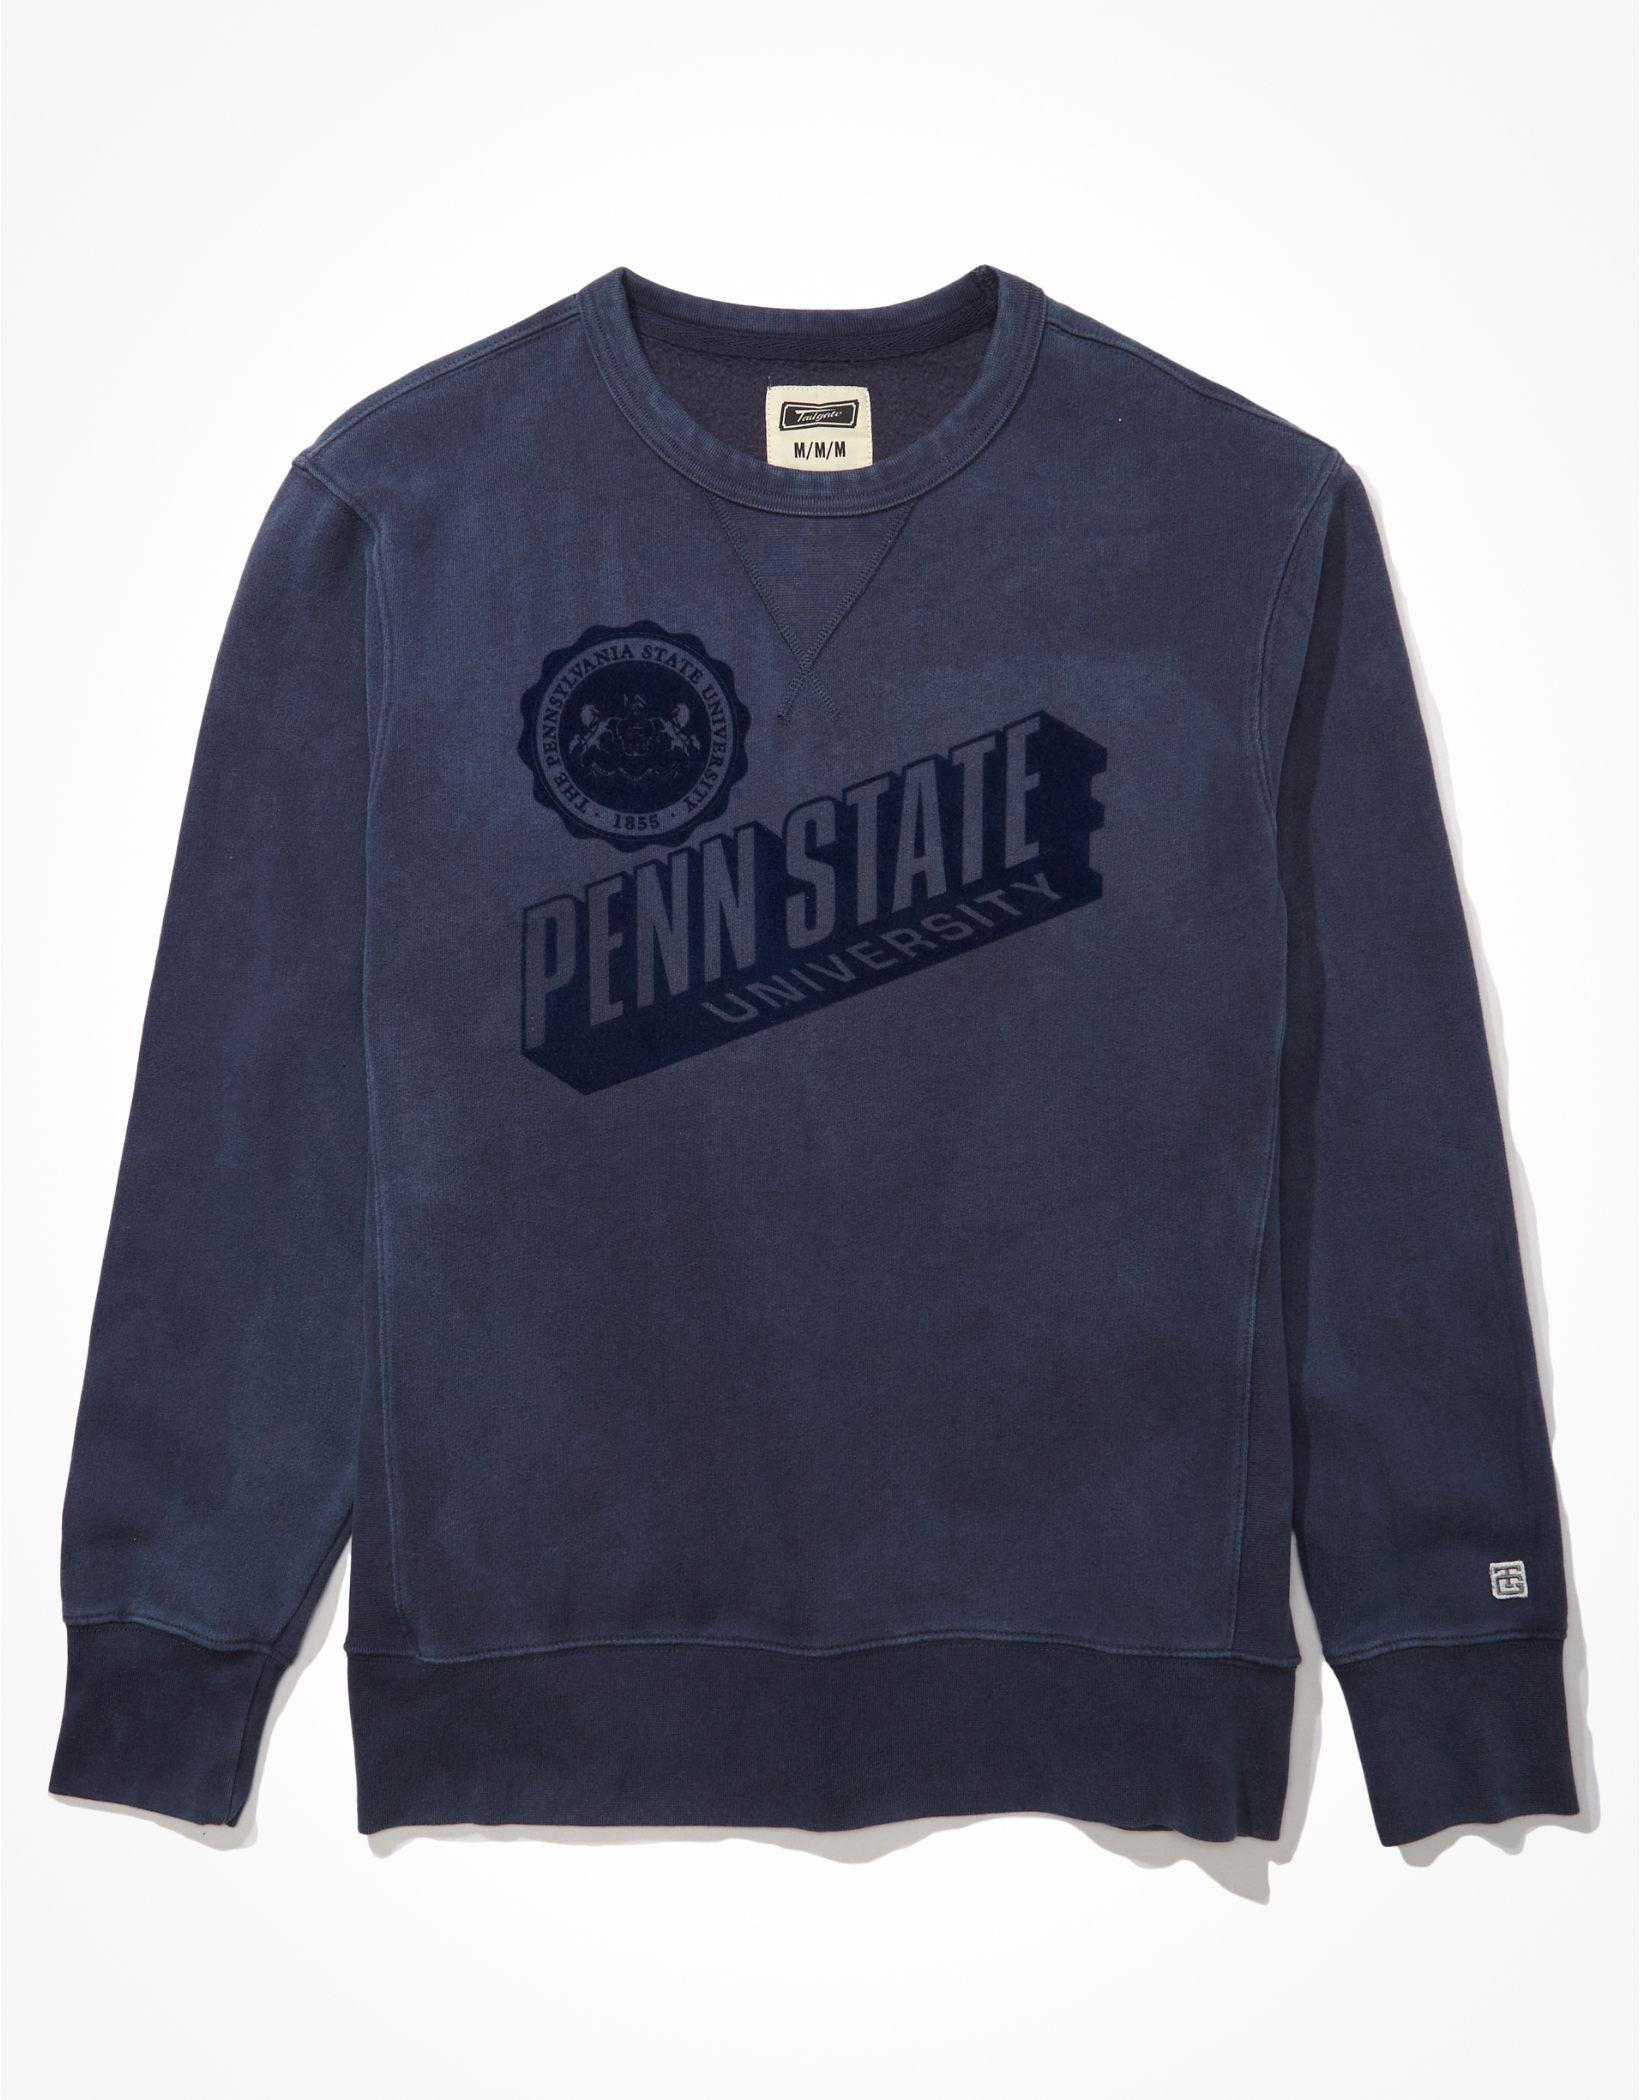 Tailgate Men's Penn State Tonal Fleece Crew Neck Sweatshirt